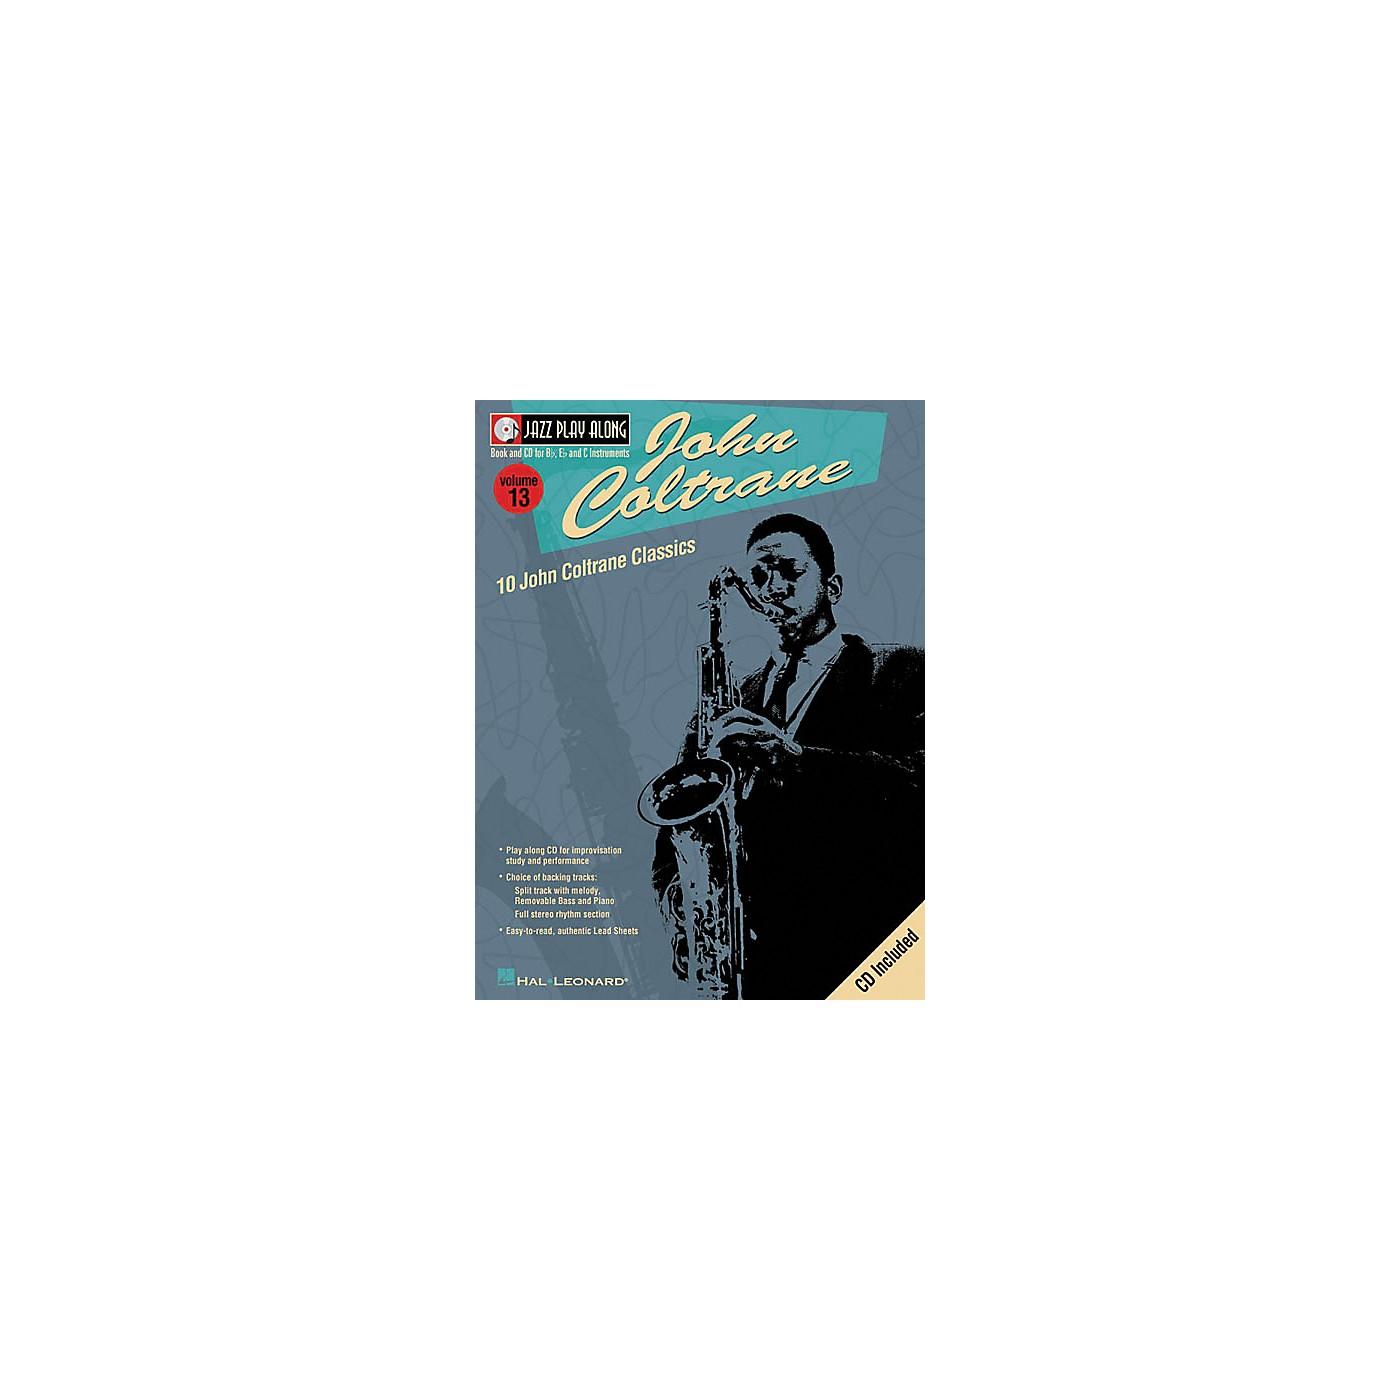 Hal Leonard John Coltrane - Jazz Play Along Volume 13 Book with CD thumbnail